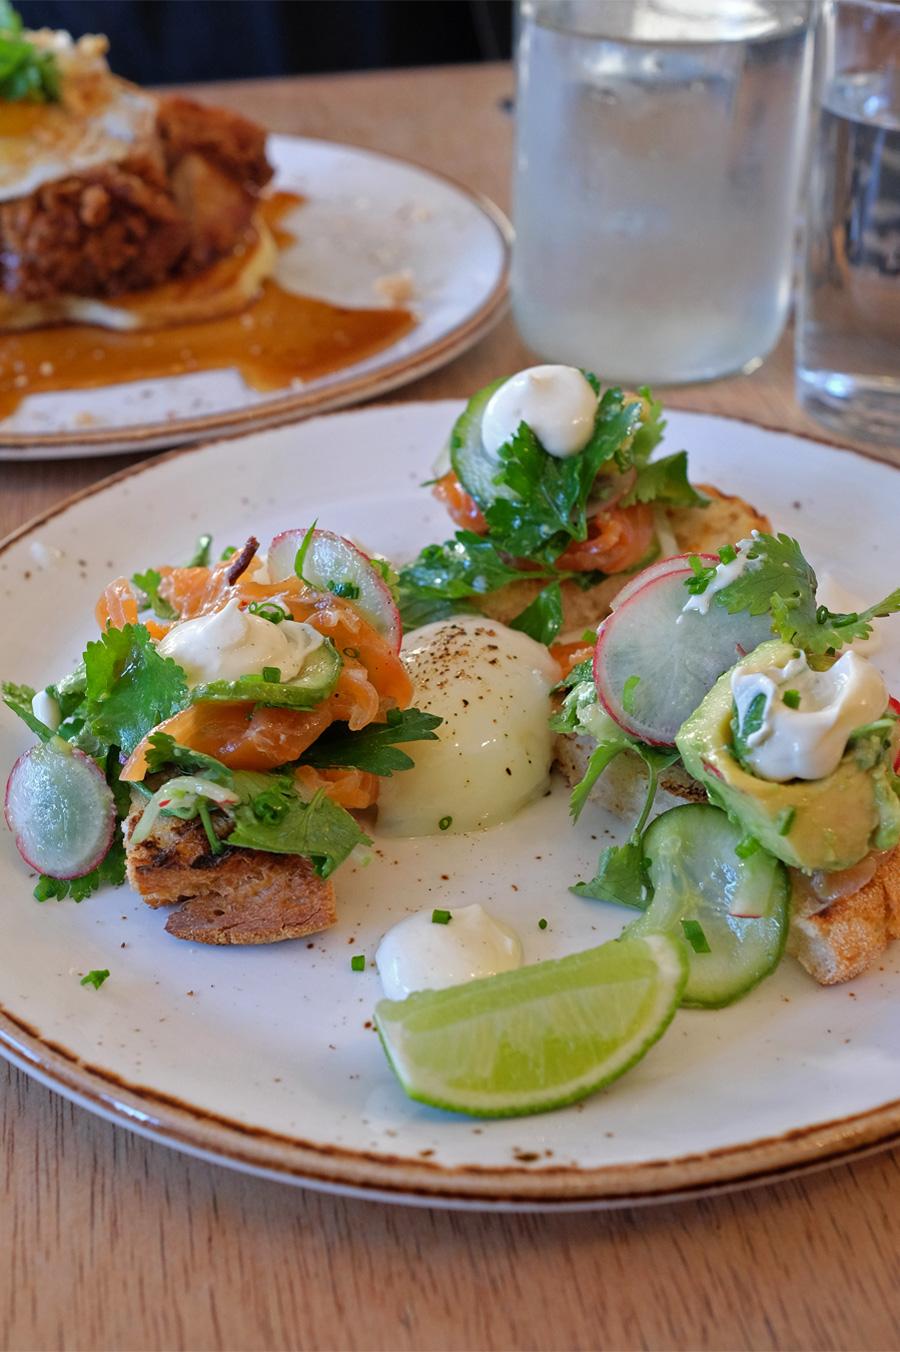 Mescal cured salmon, slow egg, avocado, jalapeno, lime, toast (AU$23)